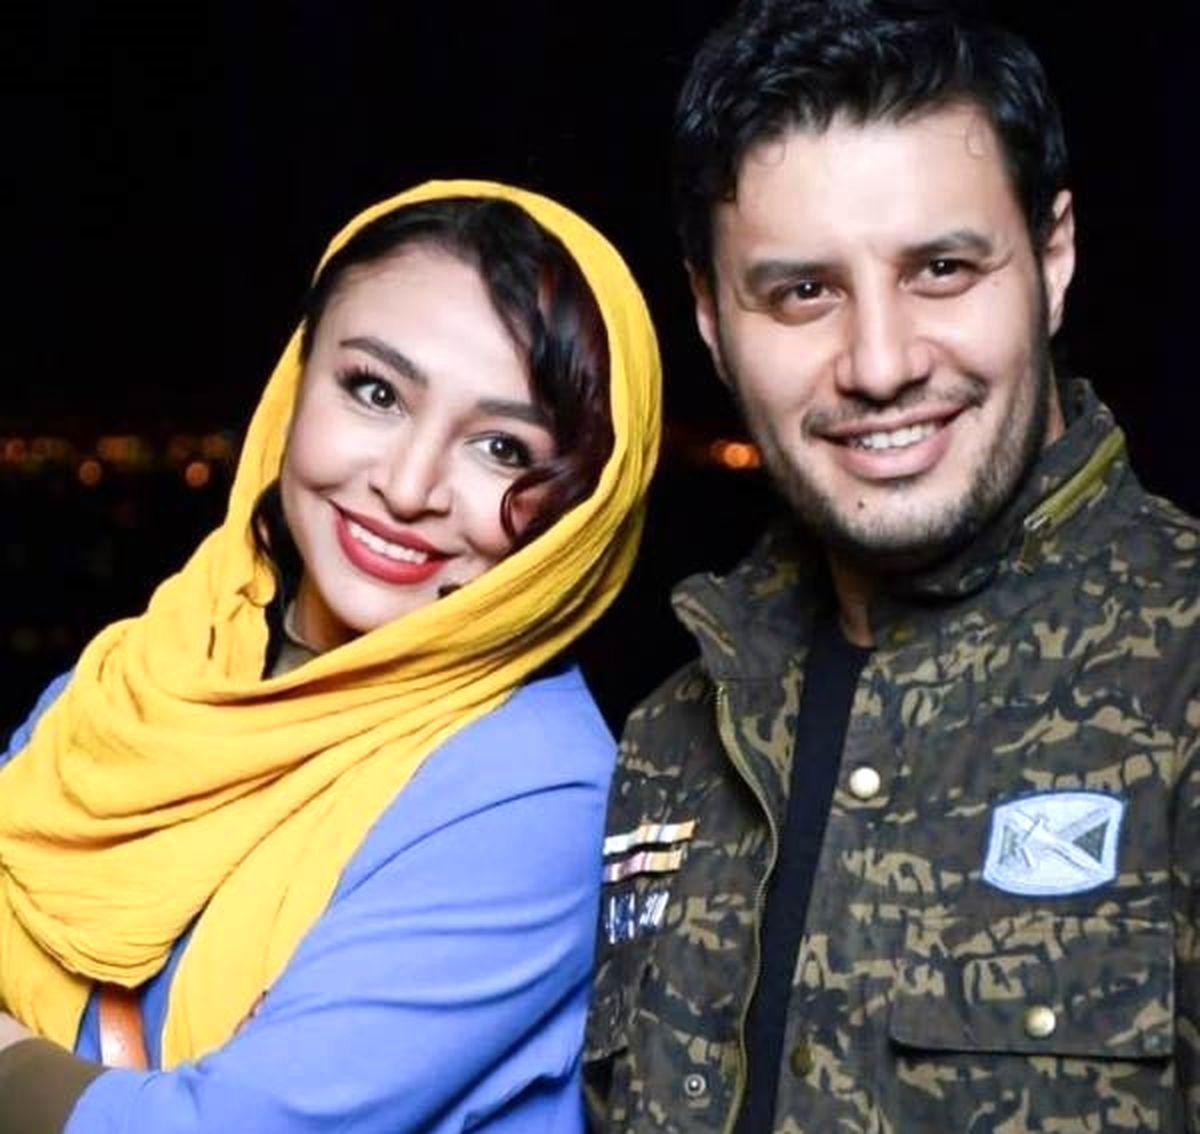 لاکچری بازی جواد عزتی و همسرش روی دریا + عکس